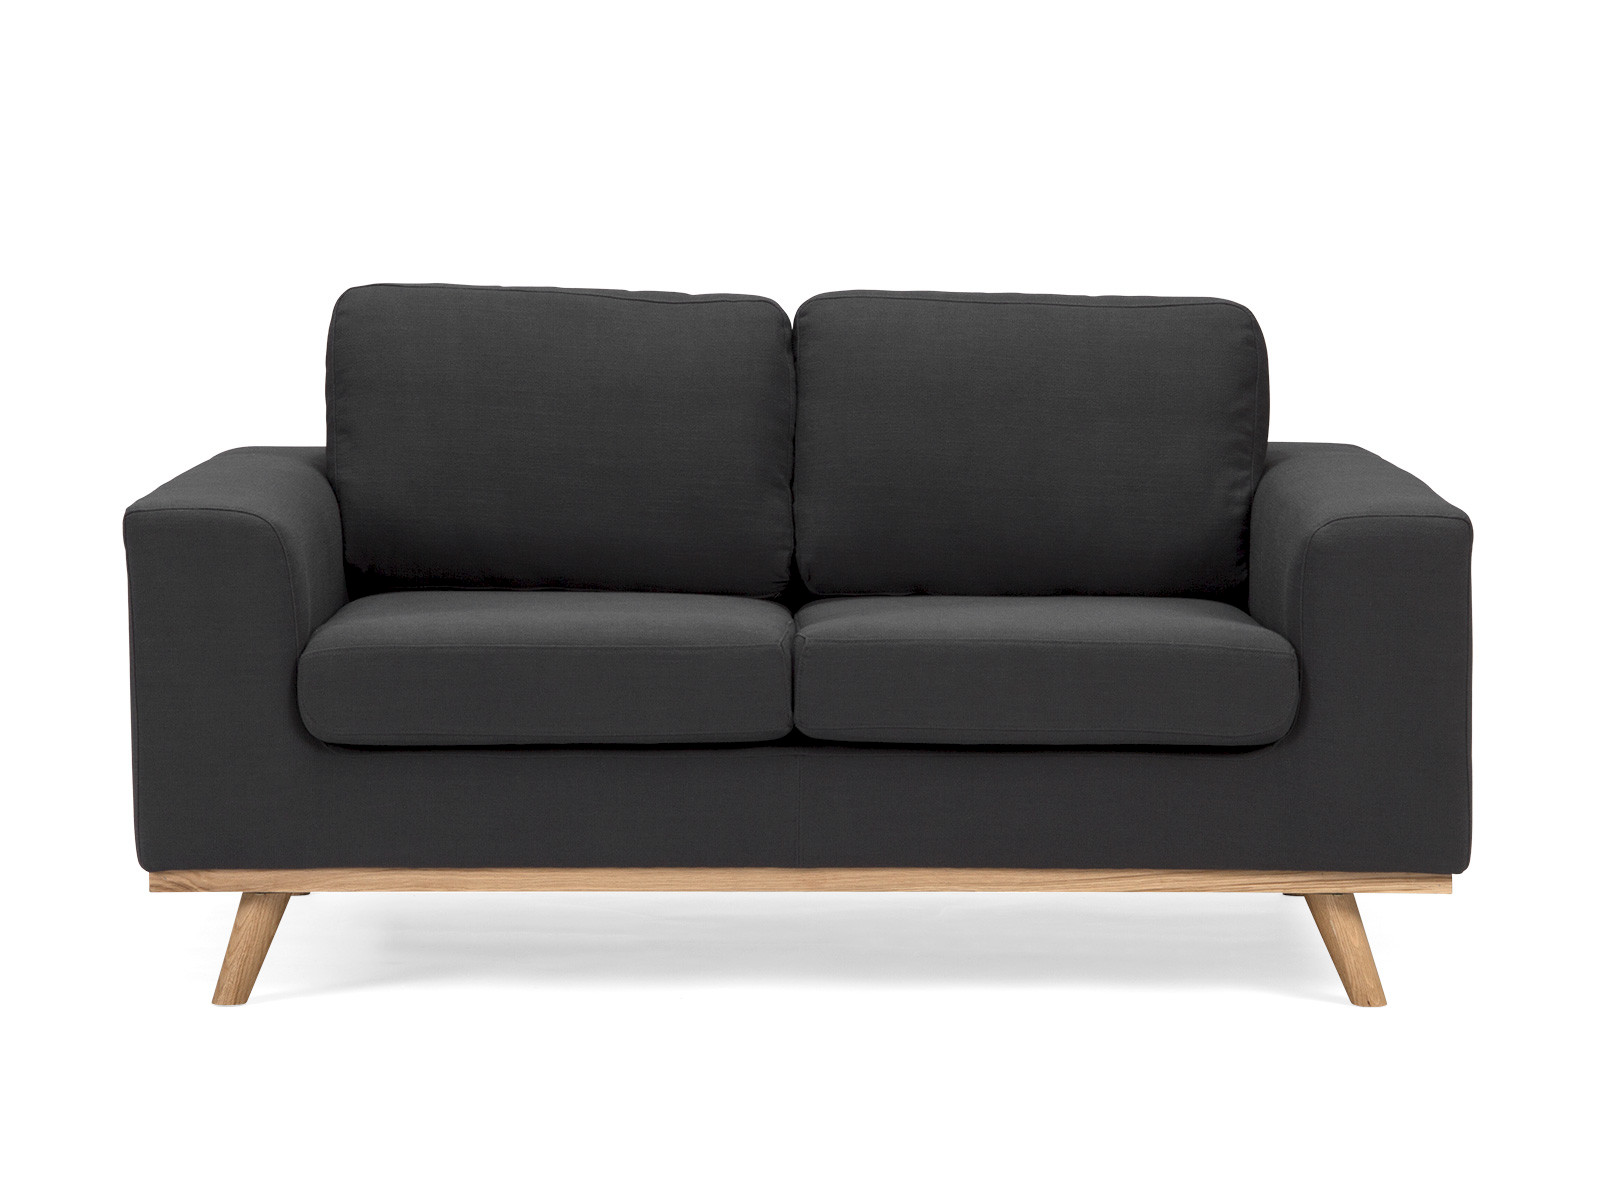 Sofa Retro Sofa Retro Top Sofa Retro Nlls Home Furniture Turkey